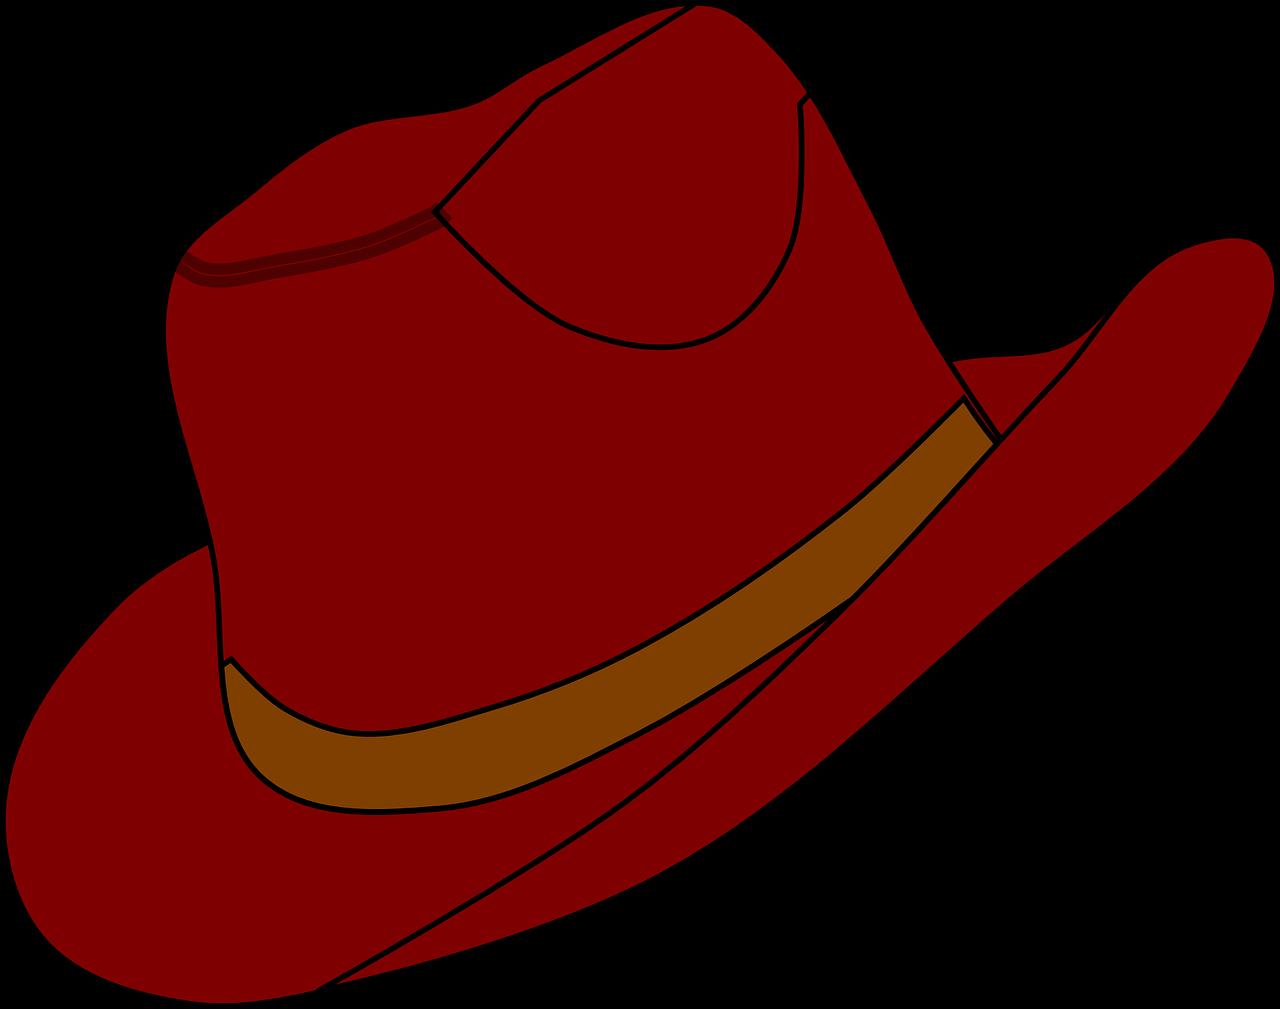 Cowboy Hat Clipart Free Danaspaj Top-Cowboy hat clipart free danaspaj top-10